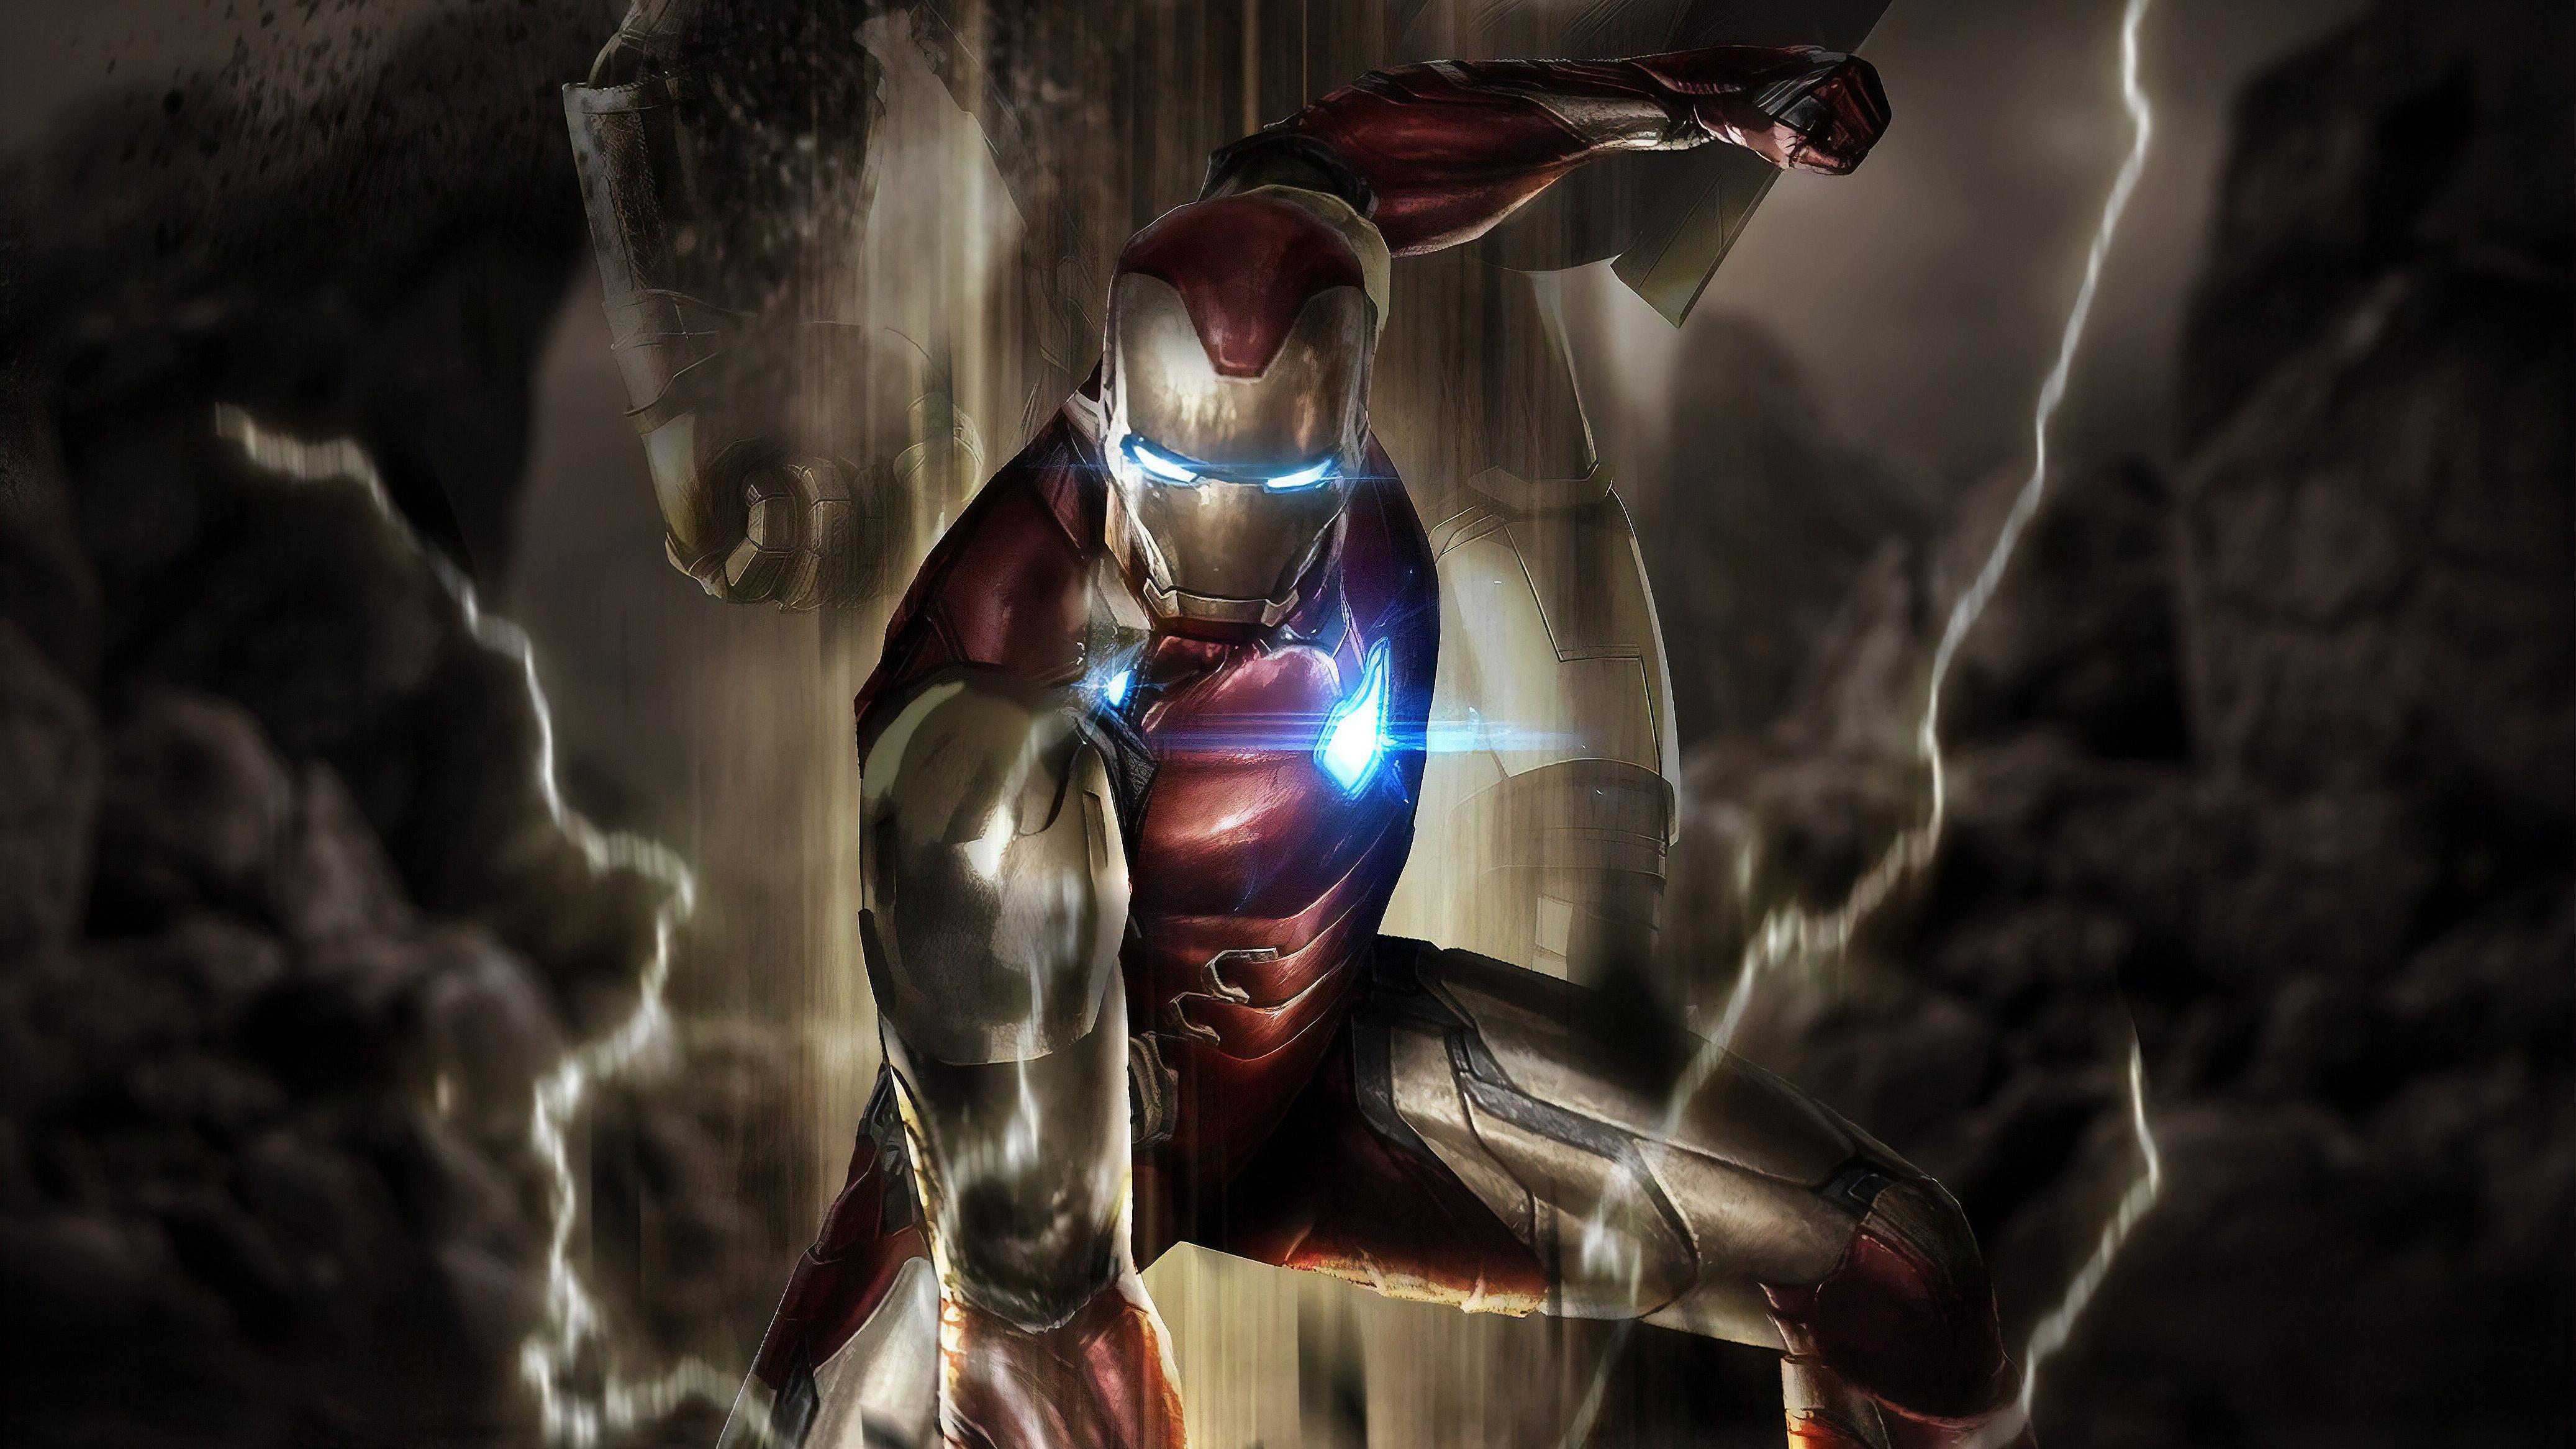 Iron Man Avengers Endgame Movie, HD Superheroes, 4k ...